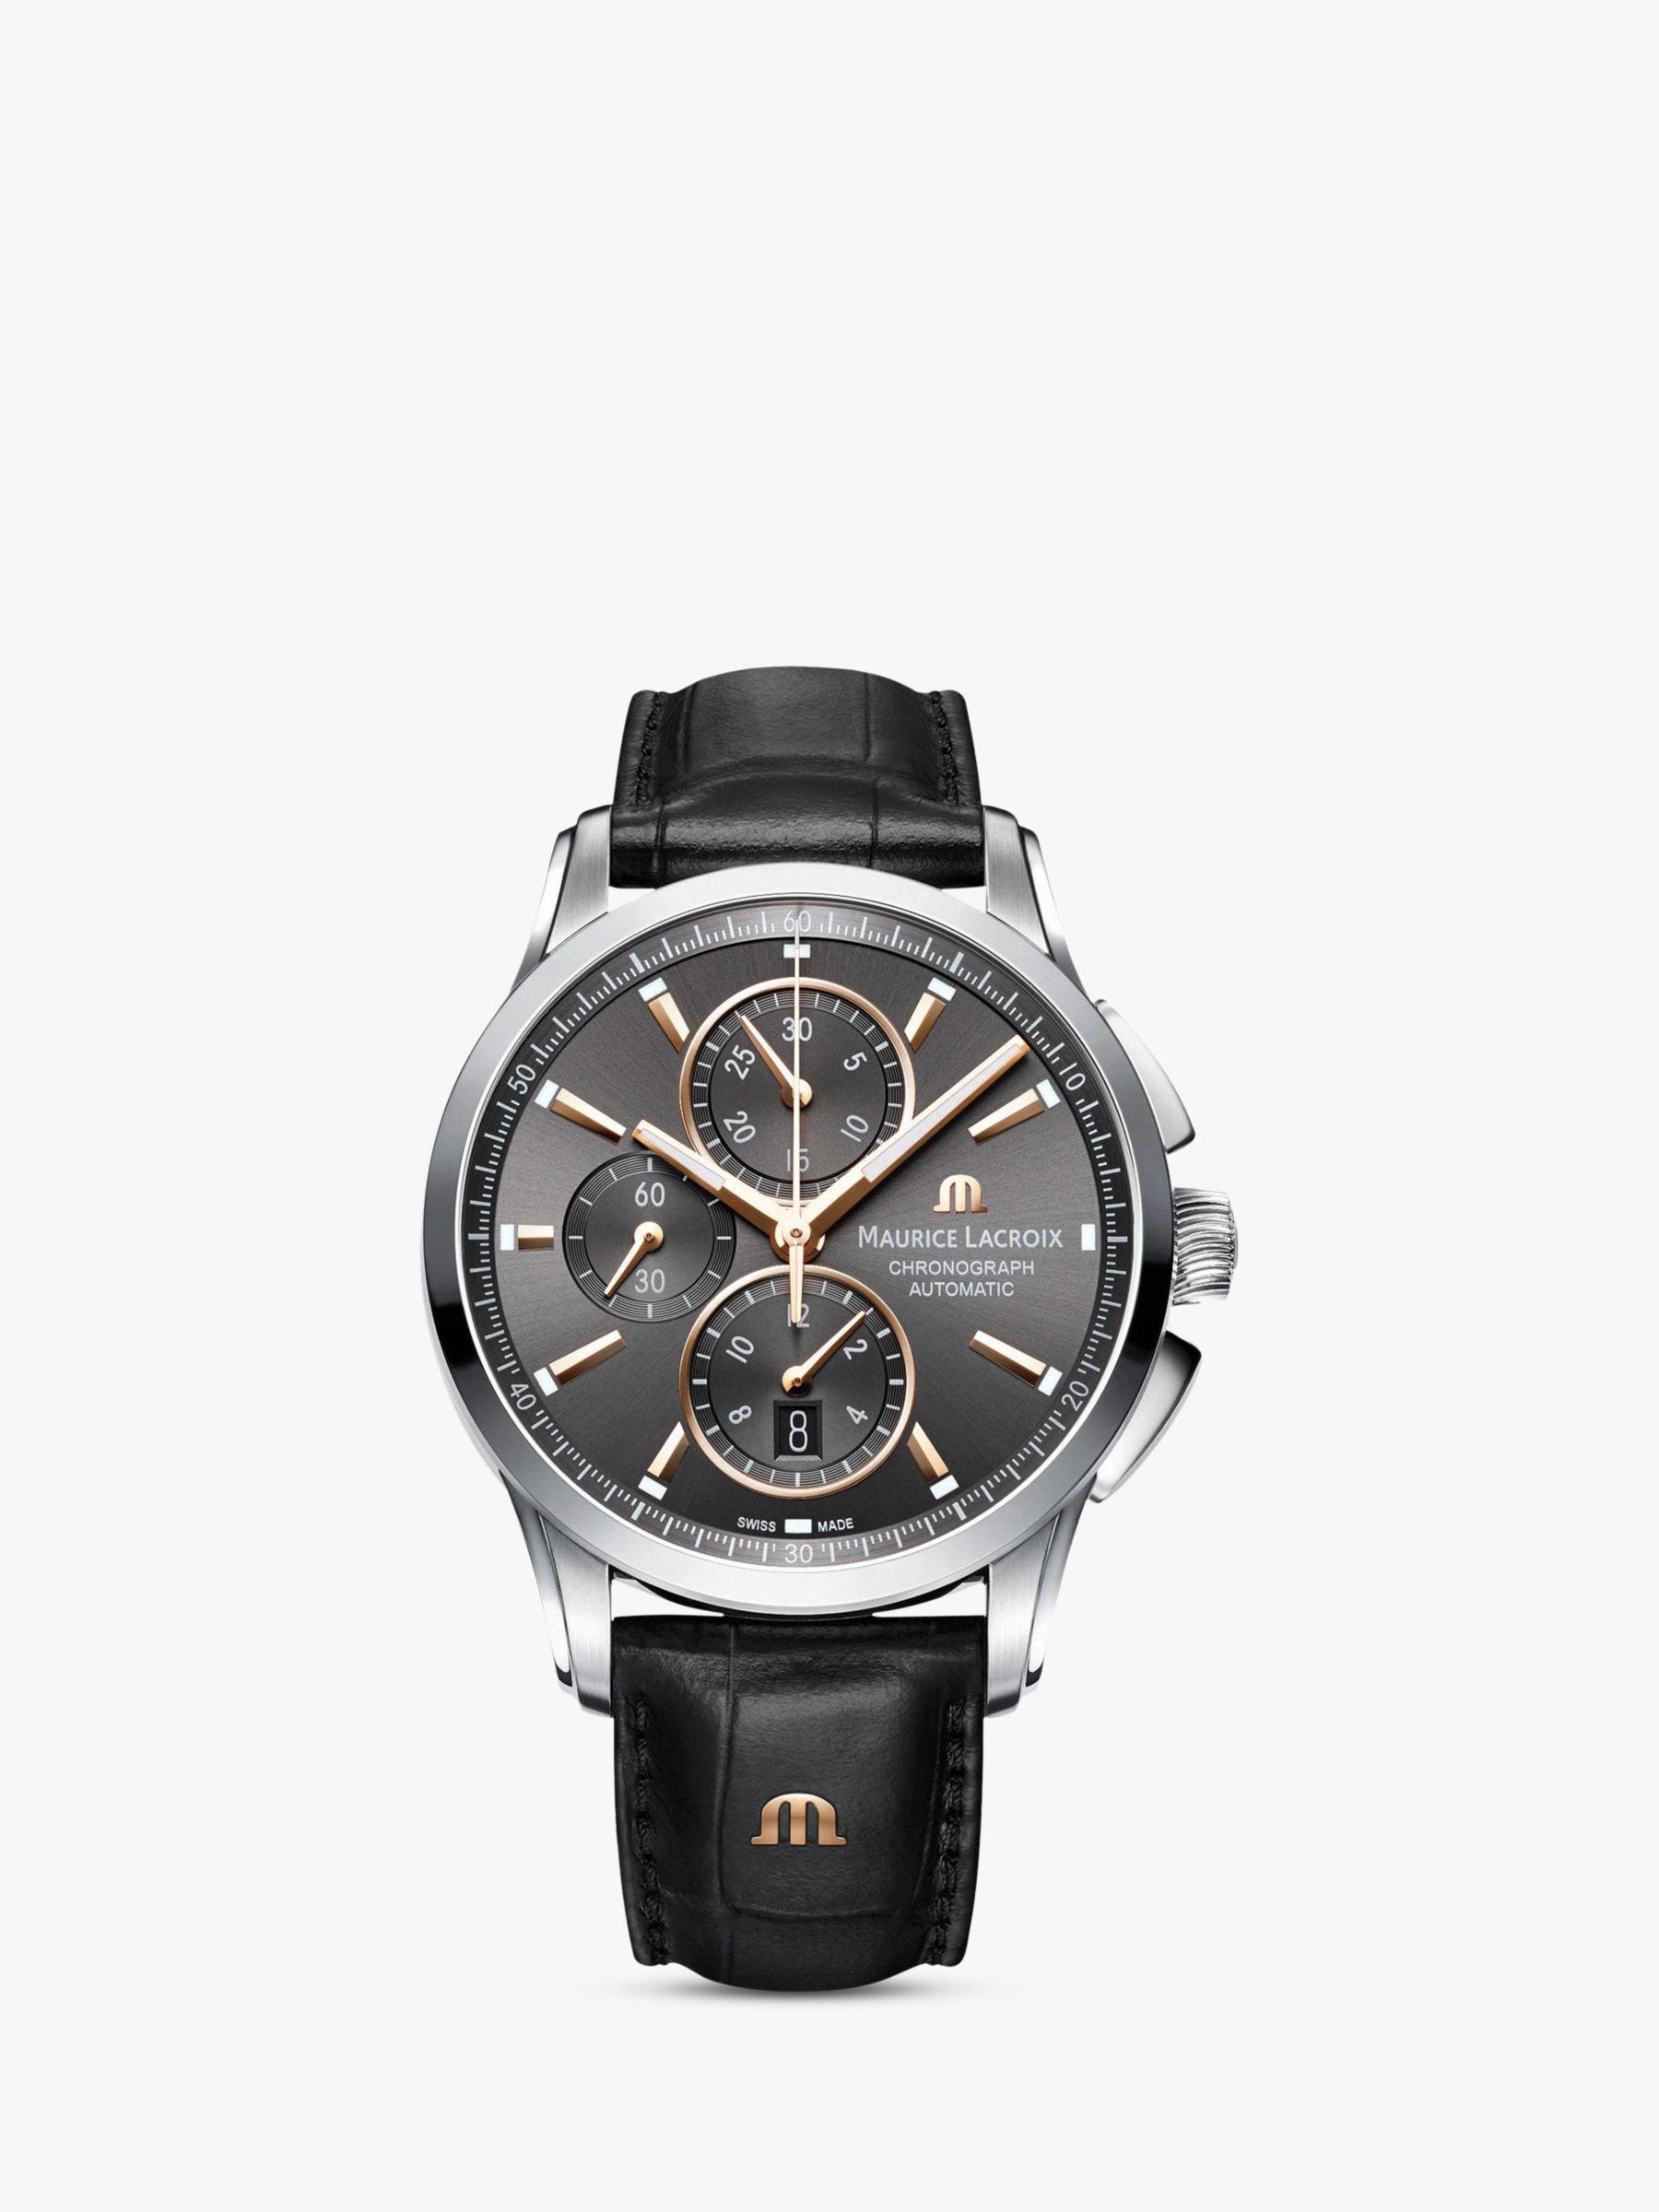 Maurice Lacroix Maurice Lacroix PT6388-SS001-331-1 Men's Pontos Chronograph Date Automatic Leather Strap Watch, Black